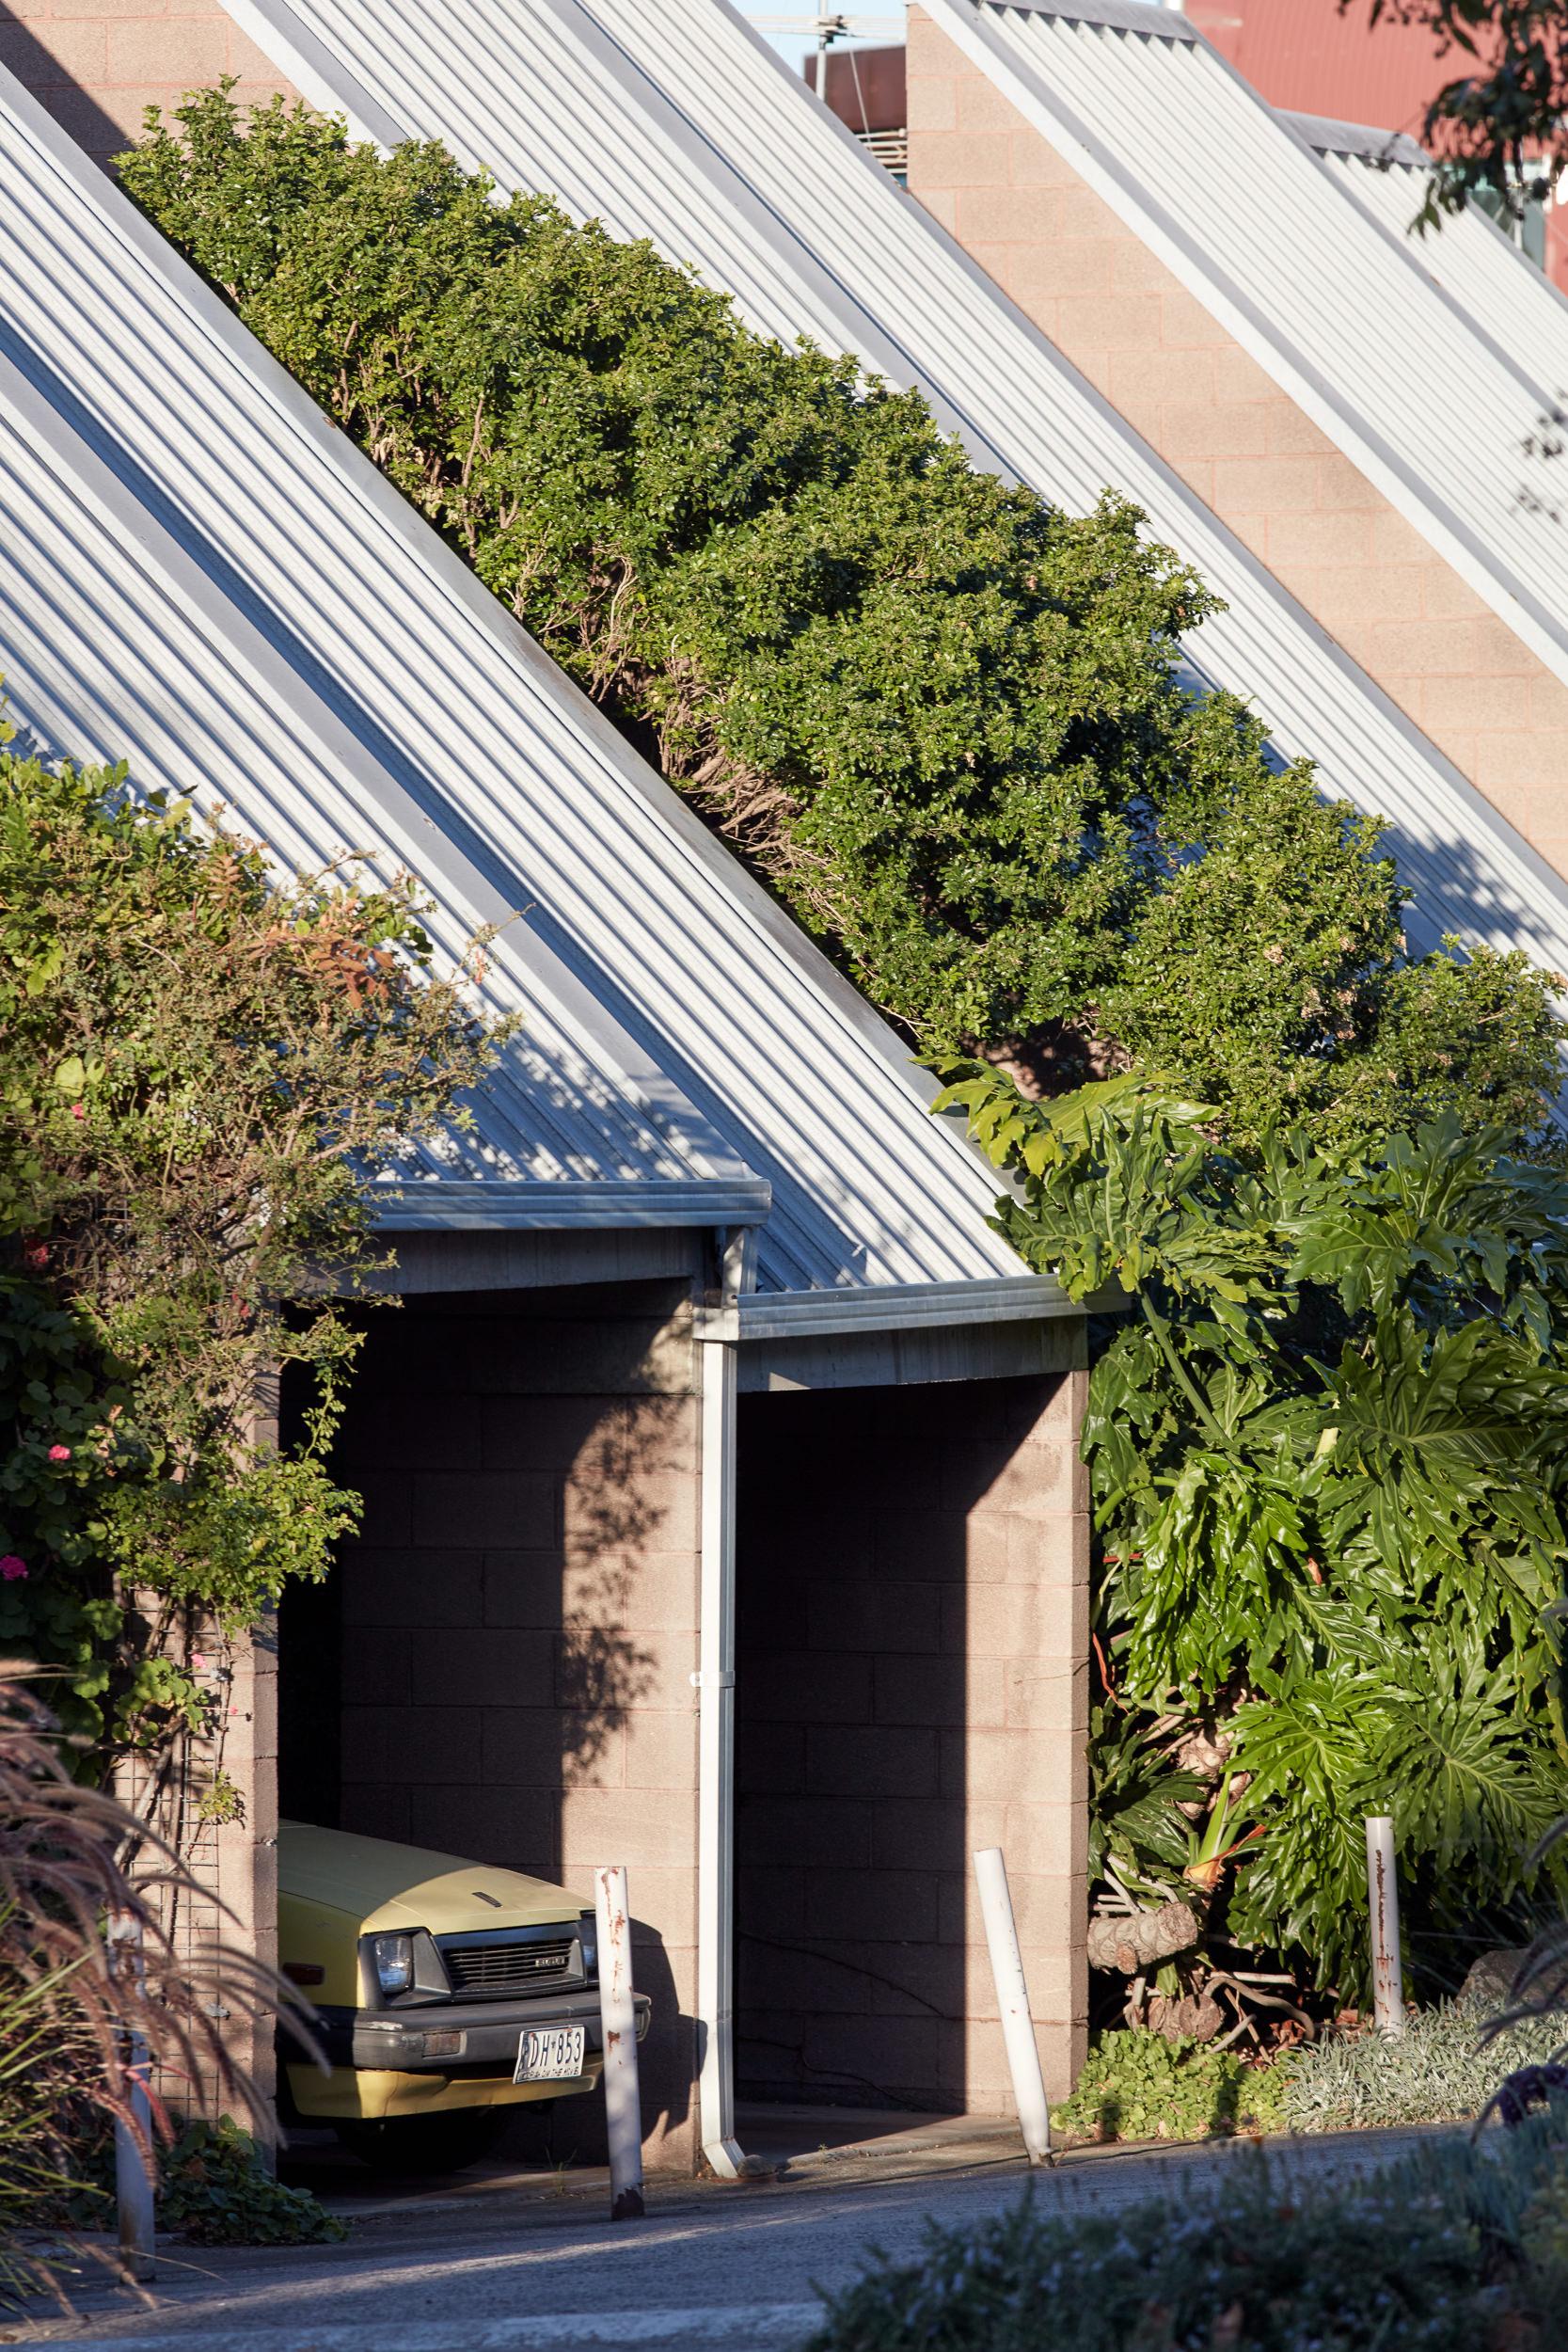 nathankdavis-nathan-k-davis-1nkd-architecture-architectural-photography-interior-exterior-design-real-estate-richmond-abinger-st-street-melbourne-5